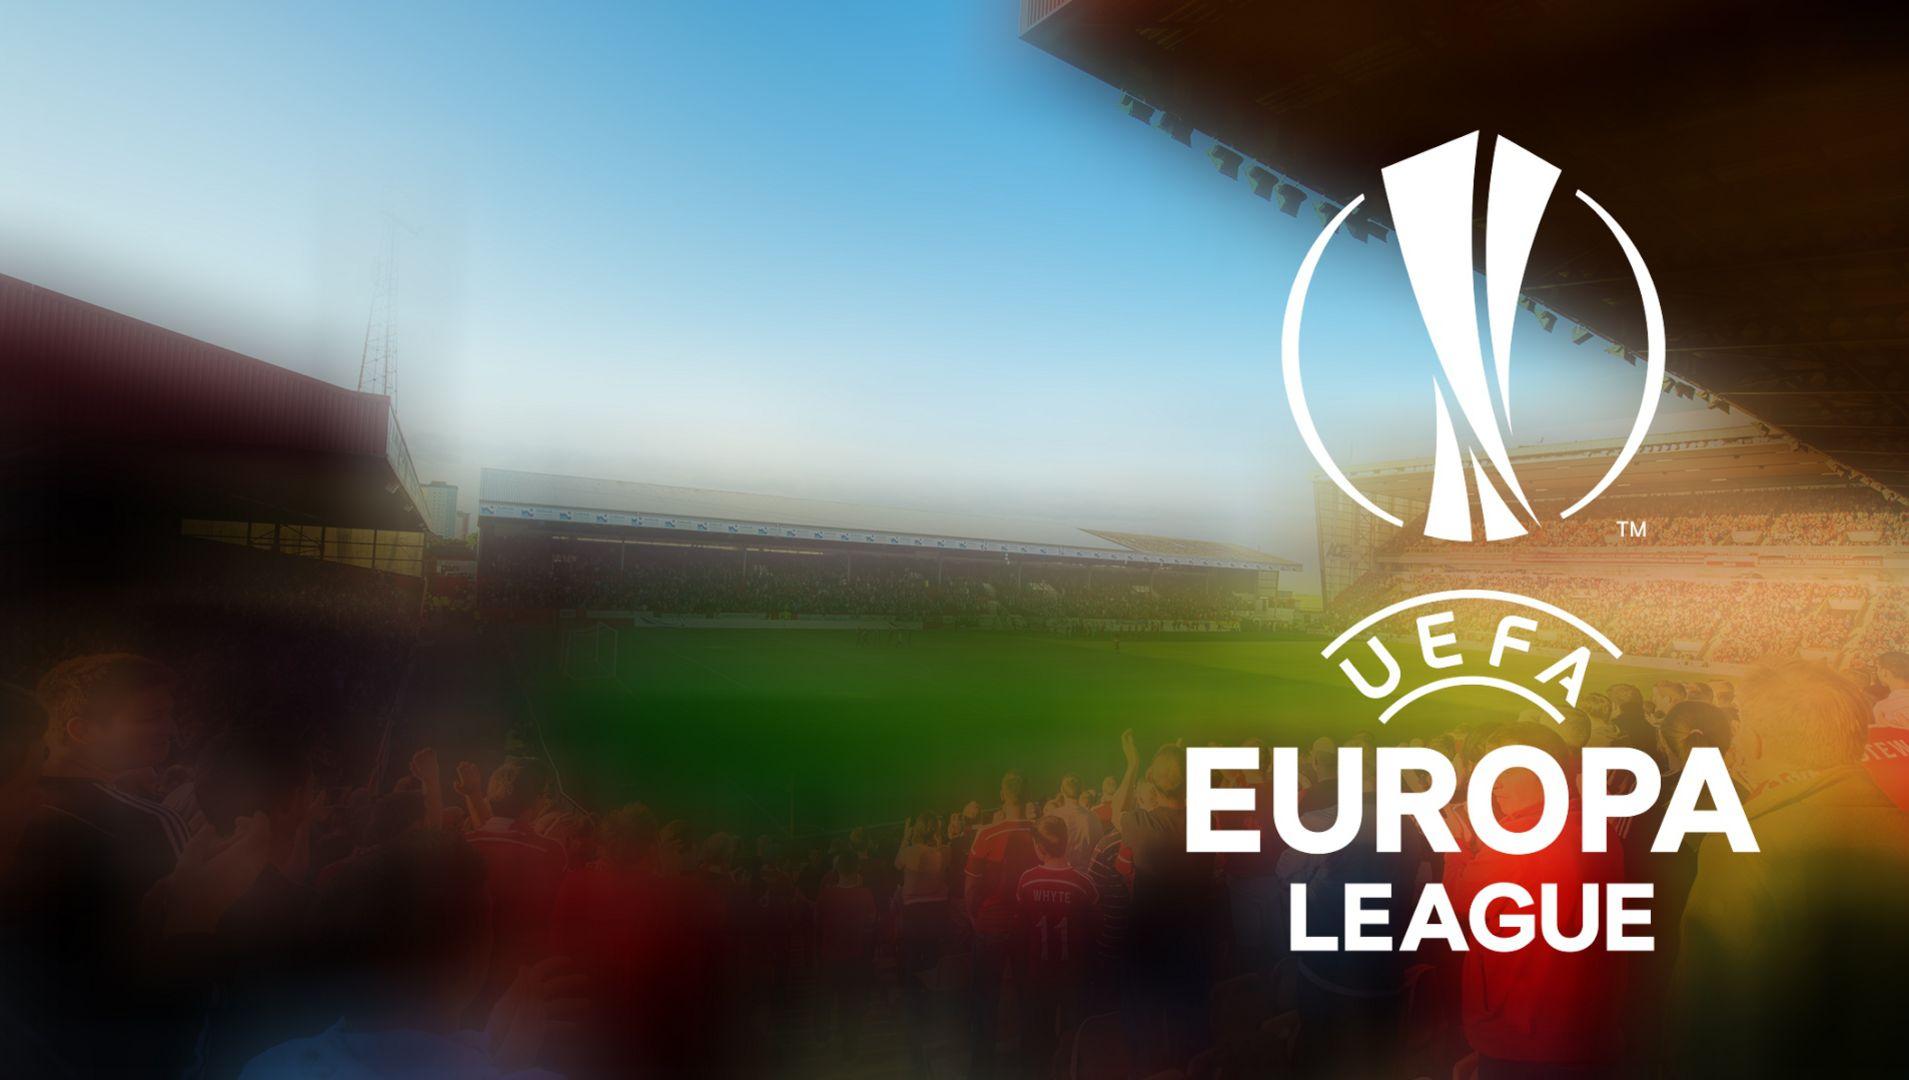 europa league - photo #18